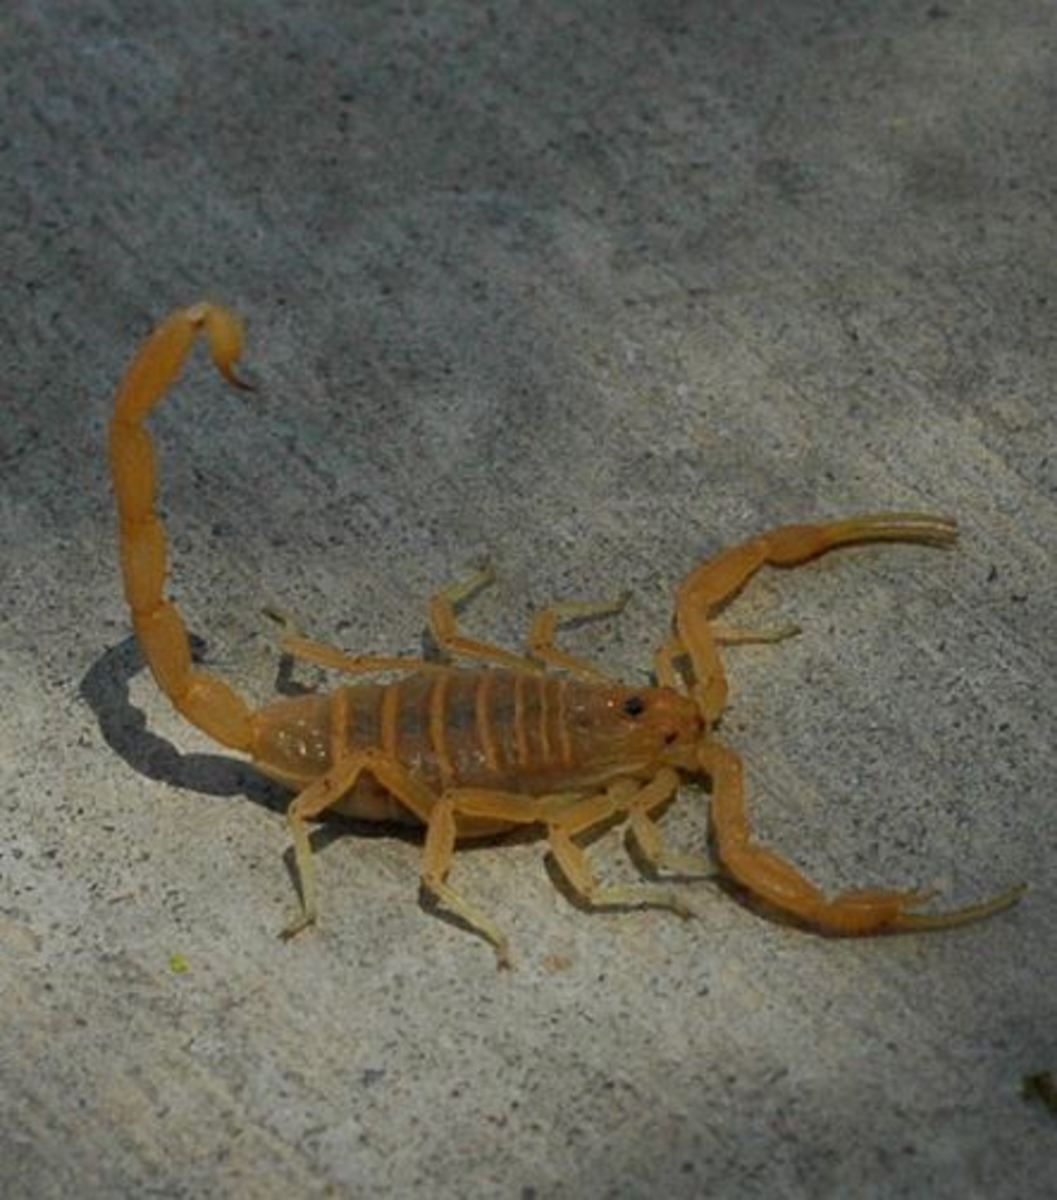 Picture of Arizona bark scorpion